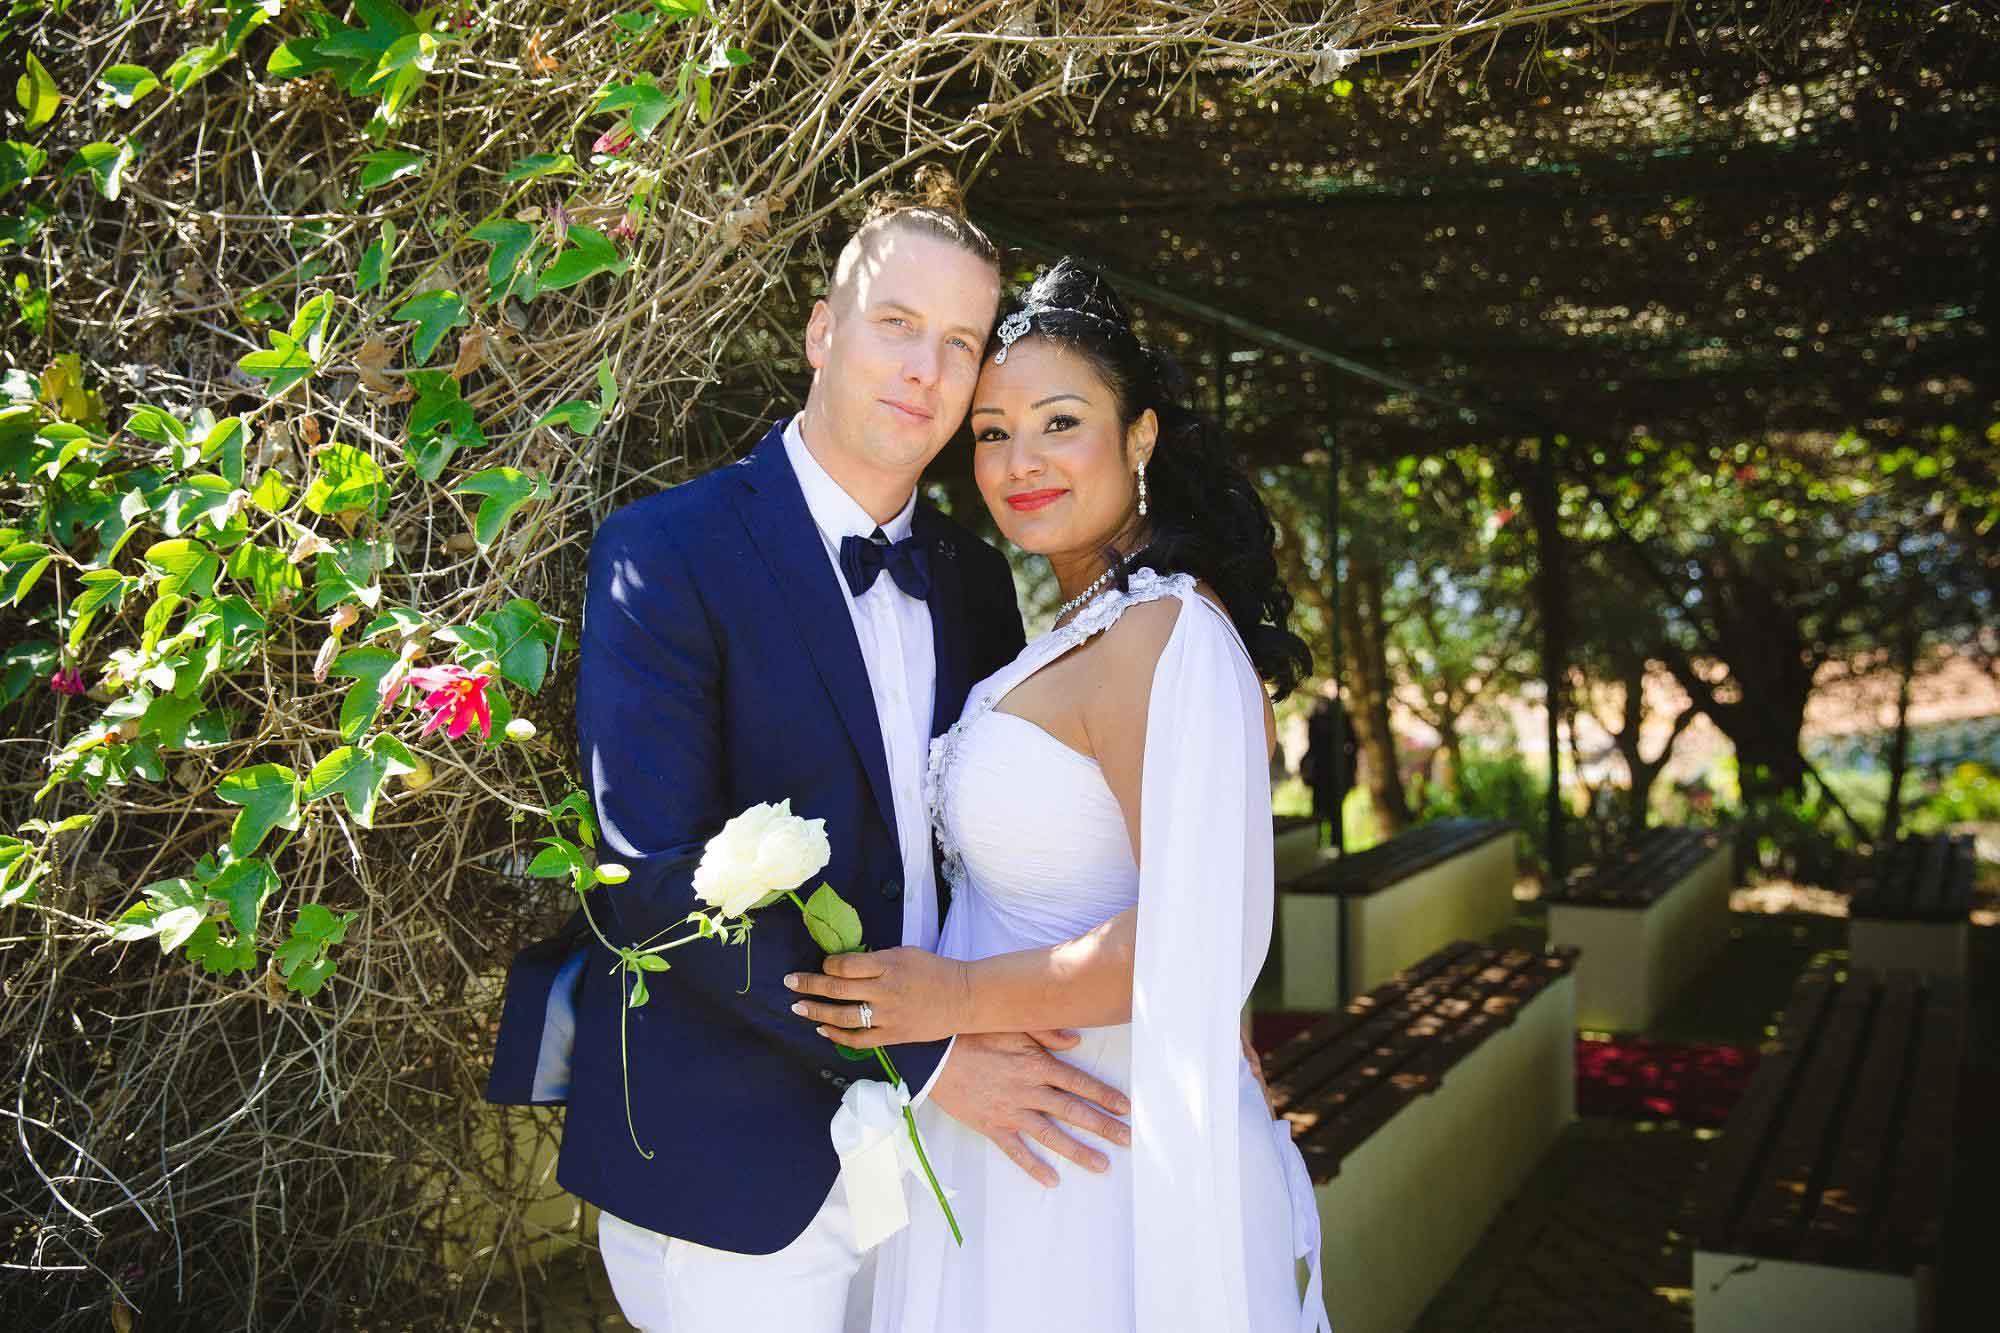 Portugal-Wedding-Photographer-74.jpg